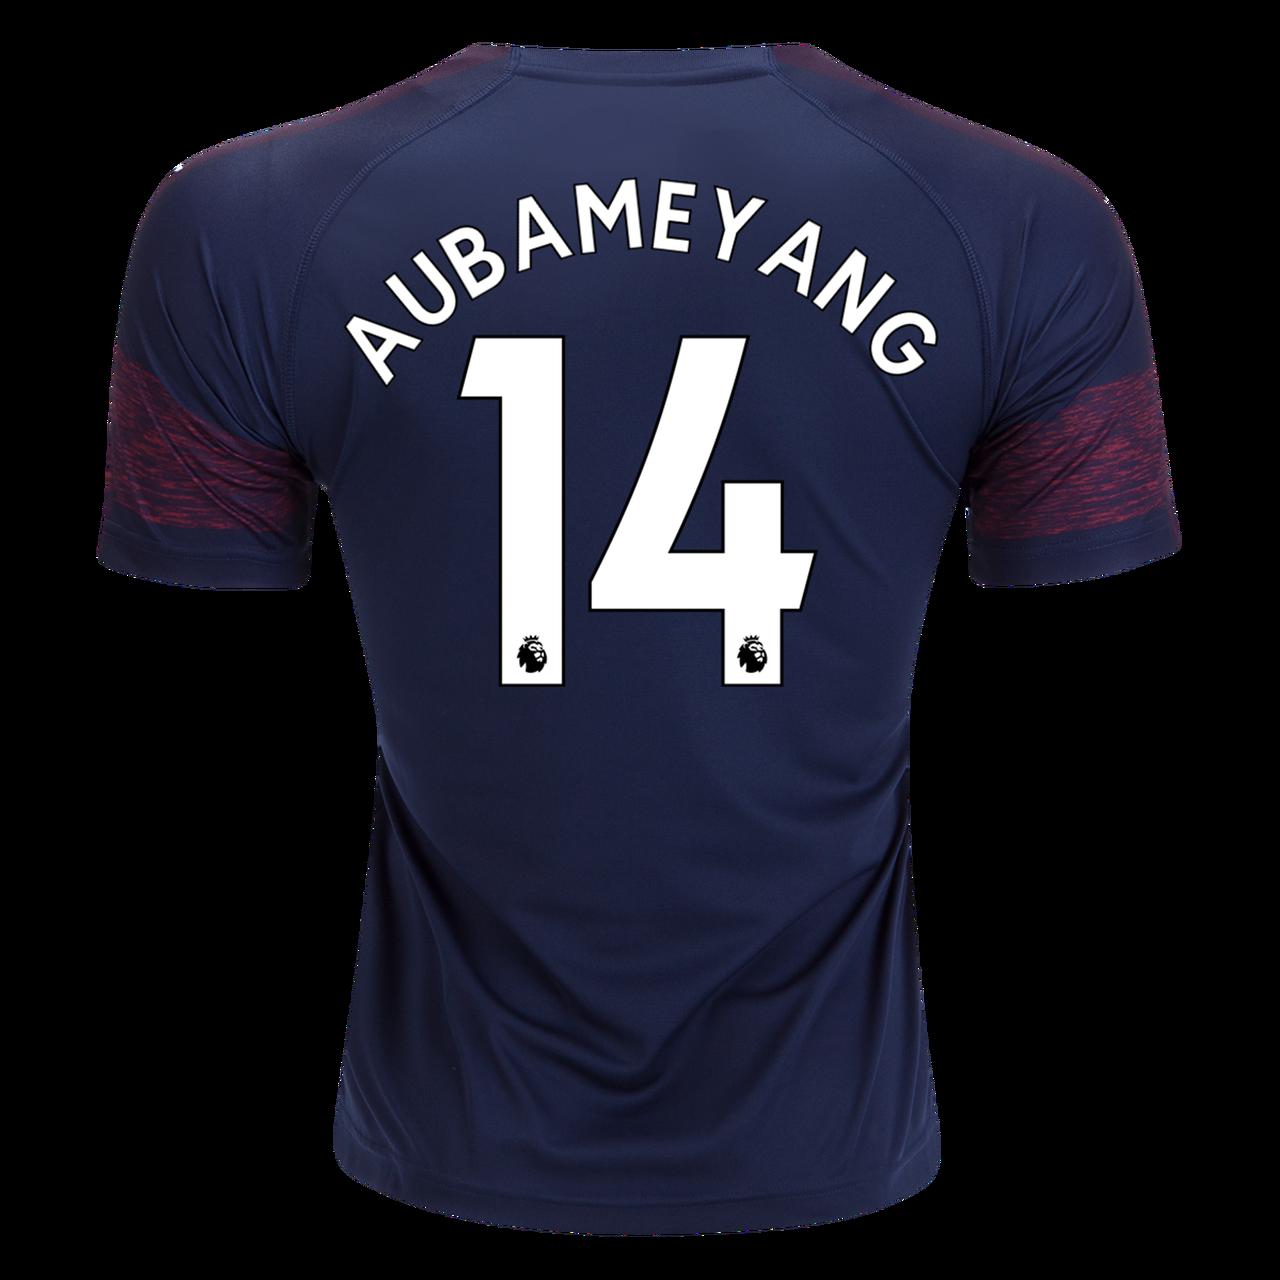 ad279028 PUMA ARSENAL 2019 AWAY `AUBAMEYANG`JERSEY NAVY BLUE - Soccer Plus